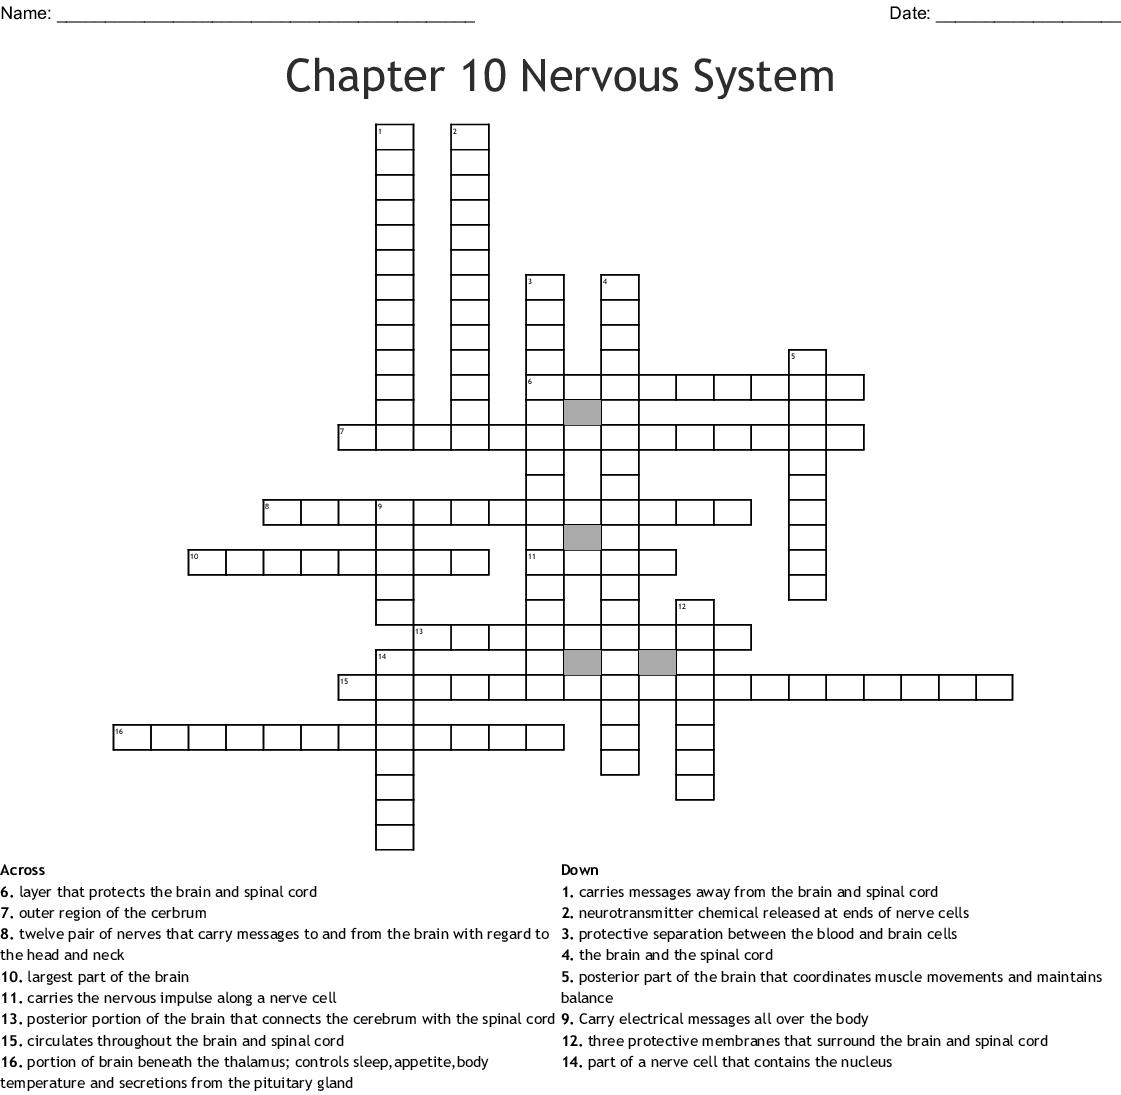 Chapter 10 Nervous System Crossword